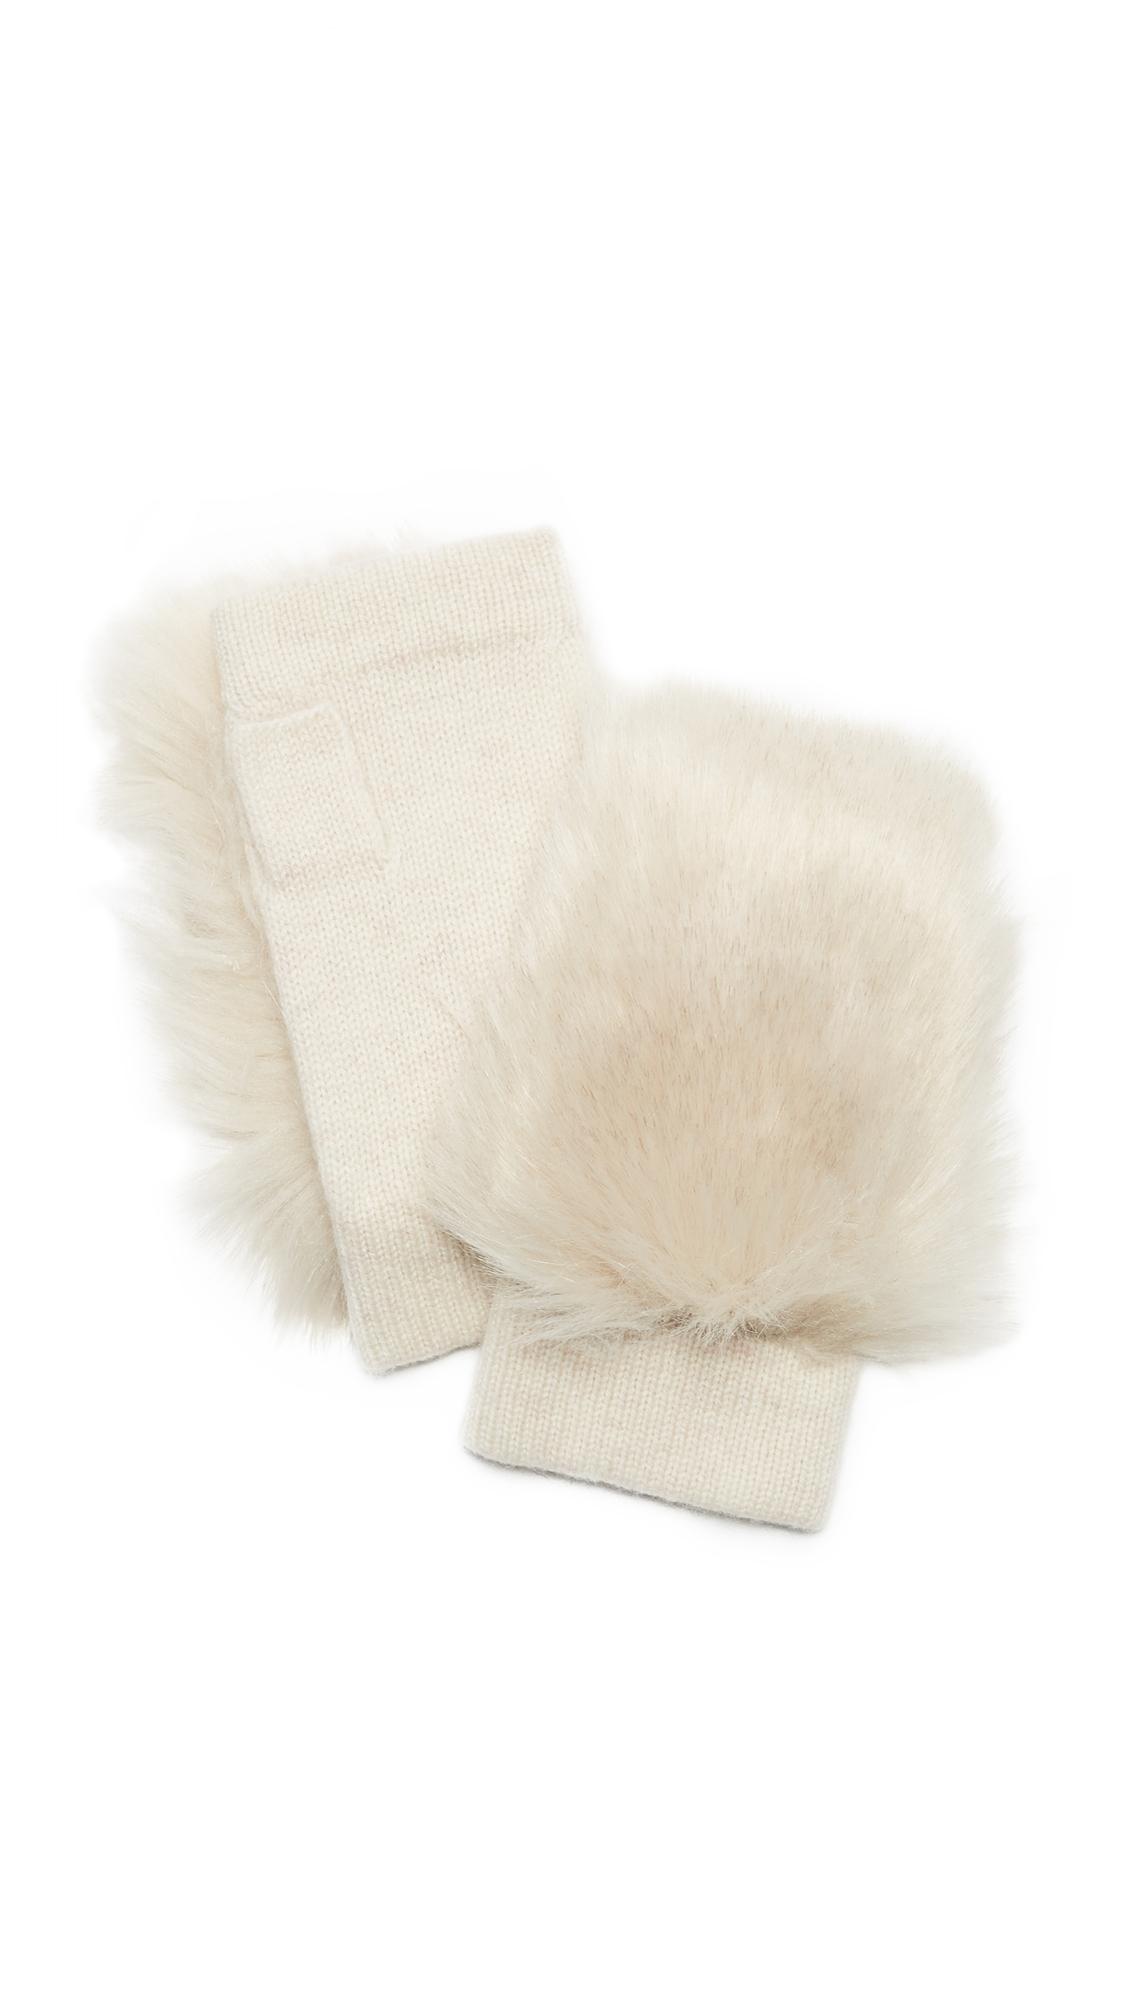 Carolina Amato Faux Fur Knit Fingerless Gloves - Oatmeal